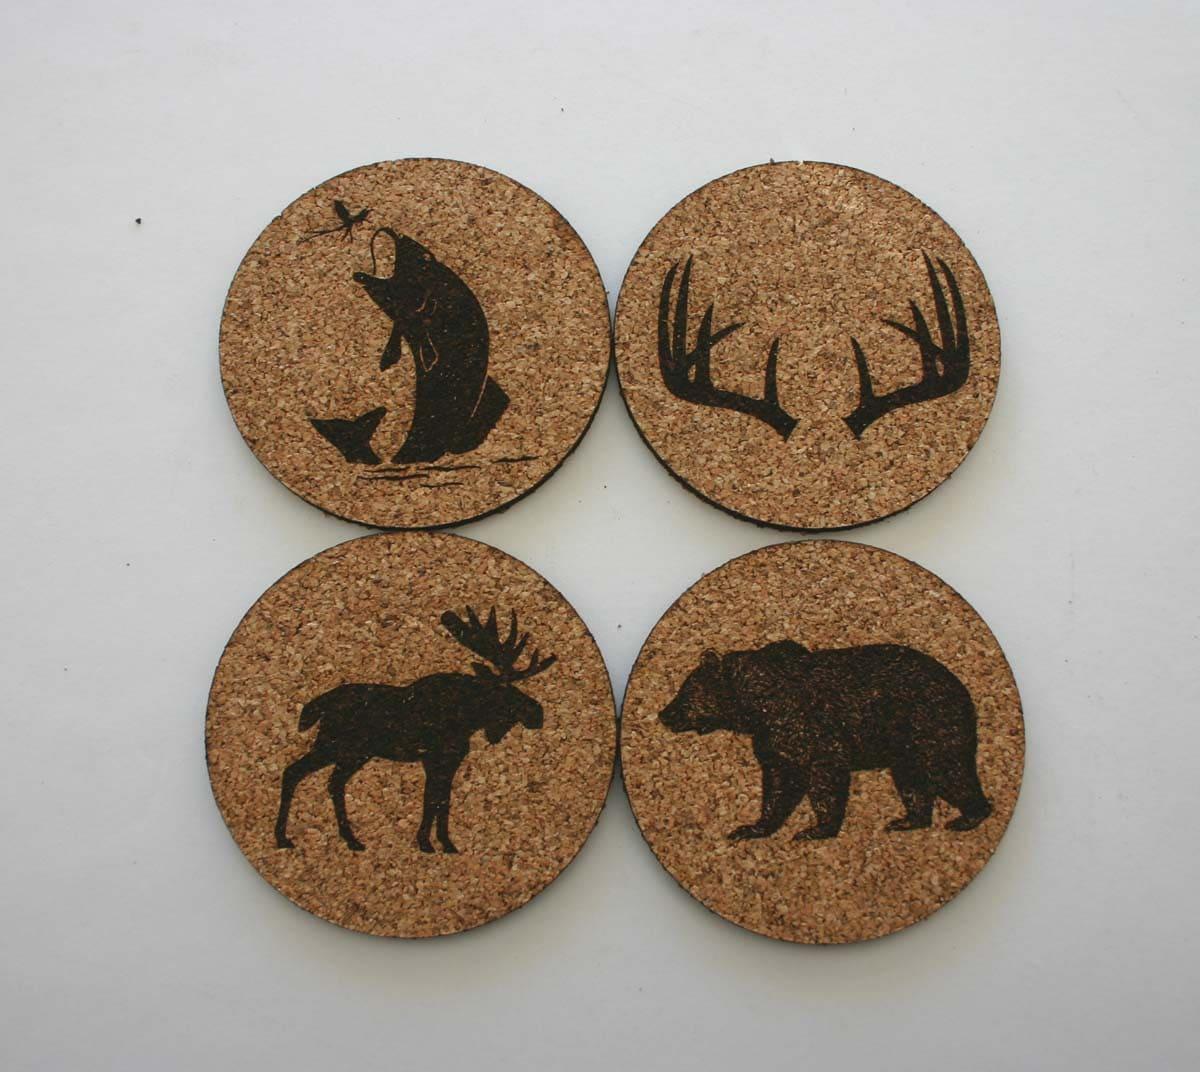 Cork People: Wildlife Cork Coasters Set Of 4 Coasters Etched Cork Bear